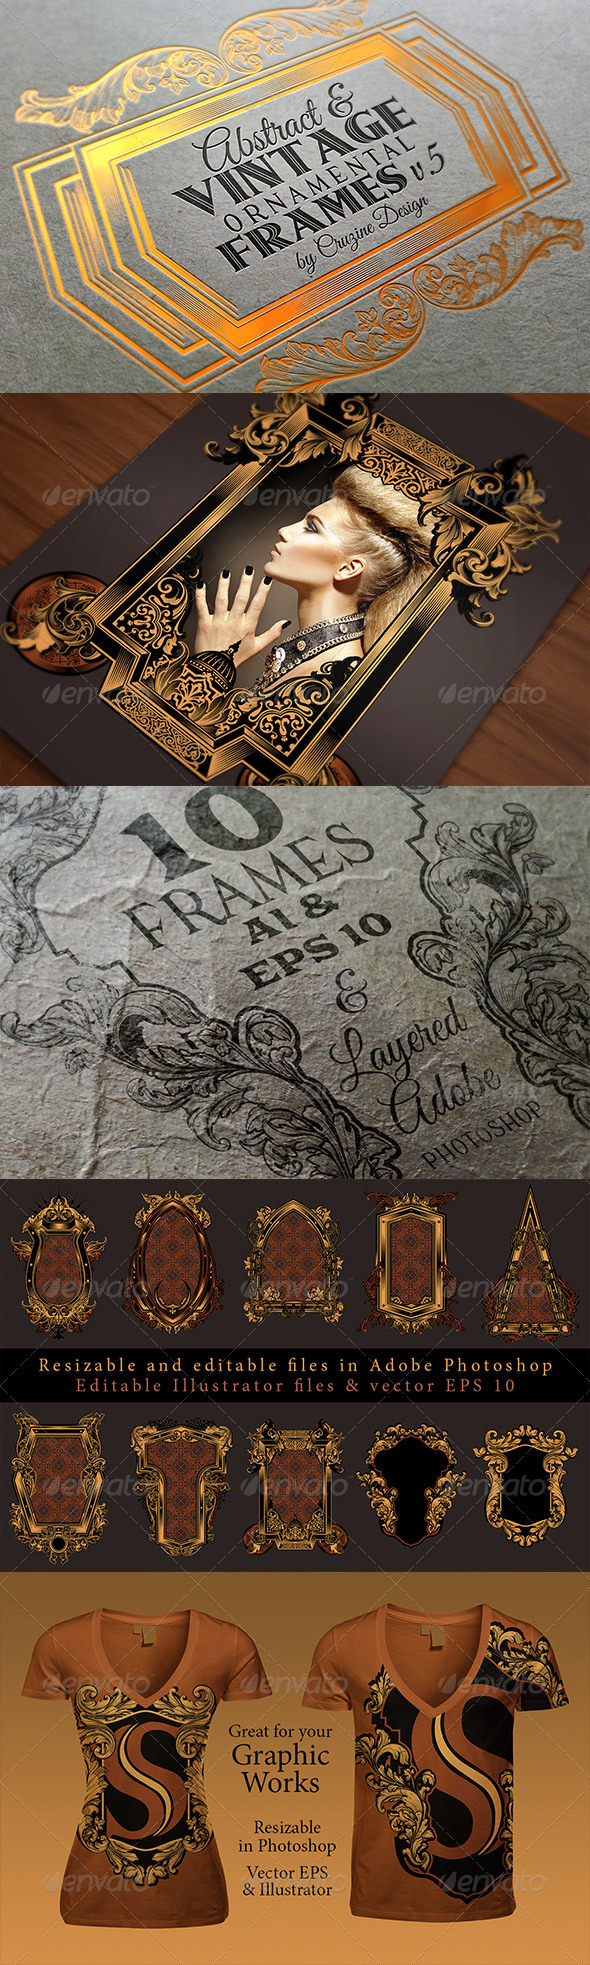 GraphicRiver 10 Frames Vol.5 Vintage Ornament 6466153